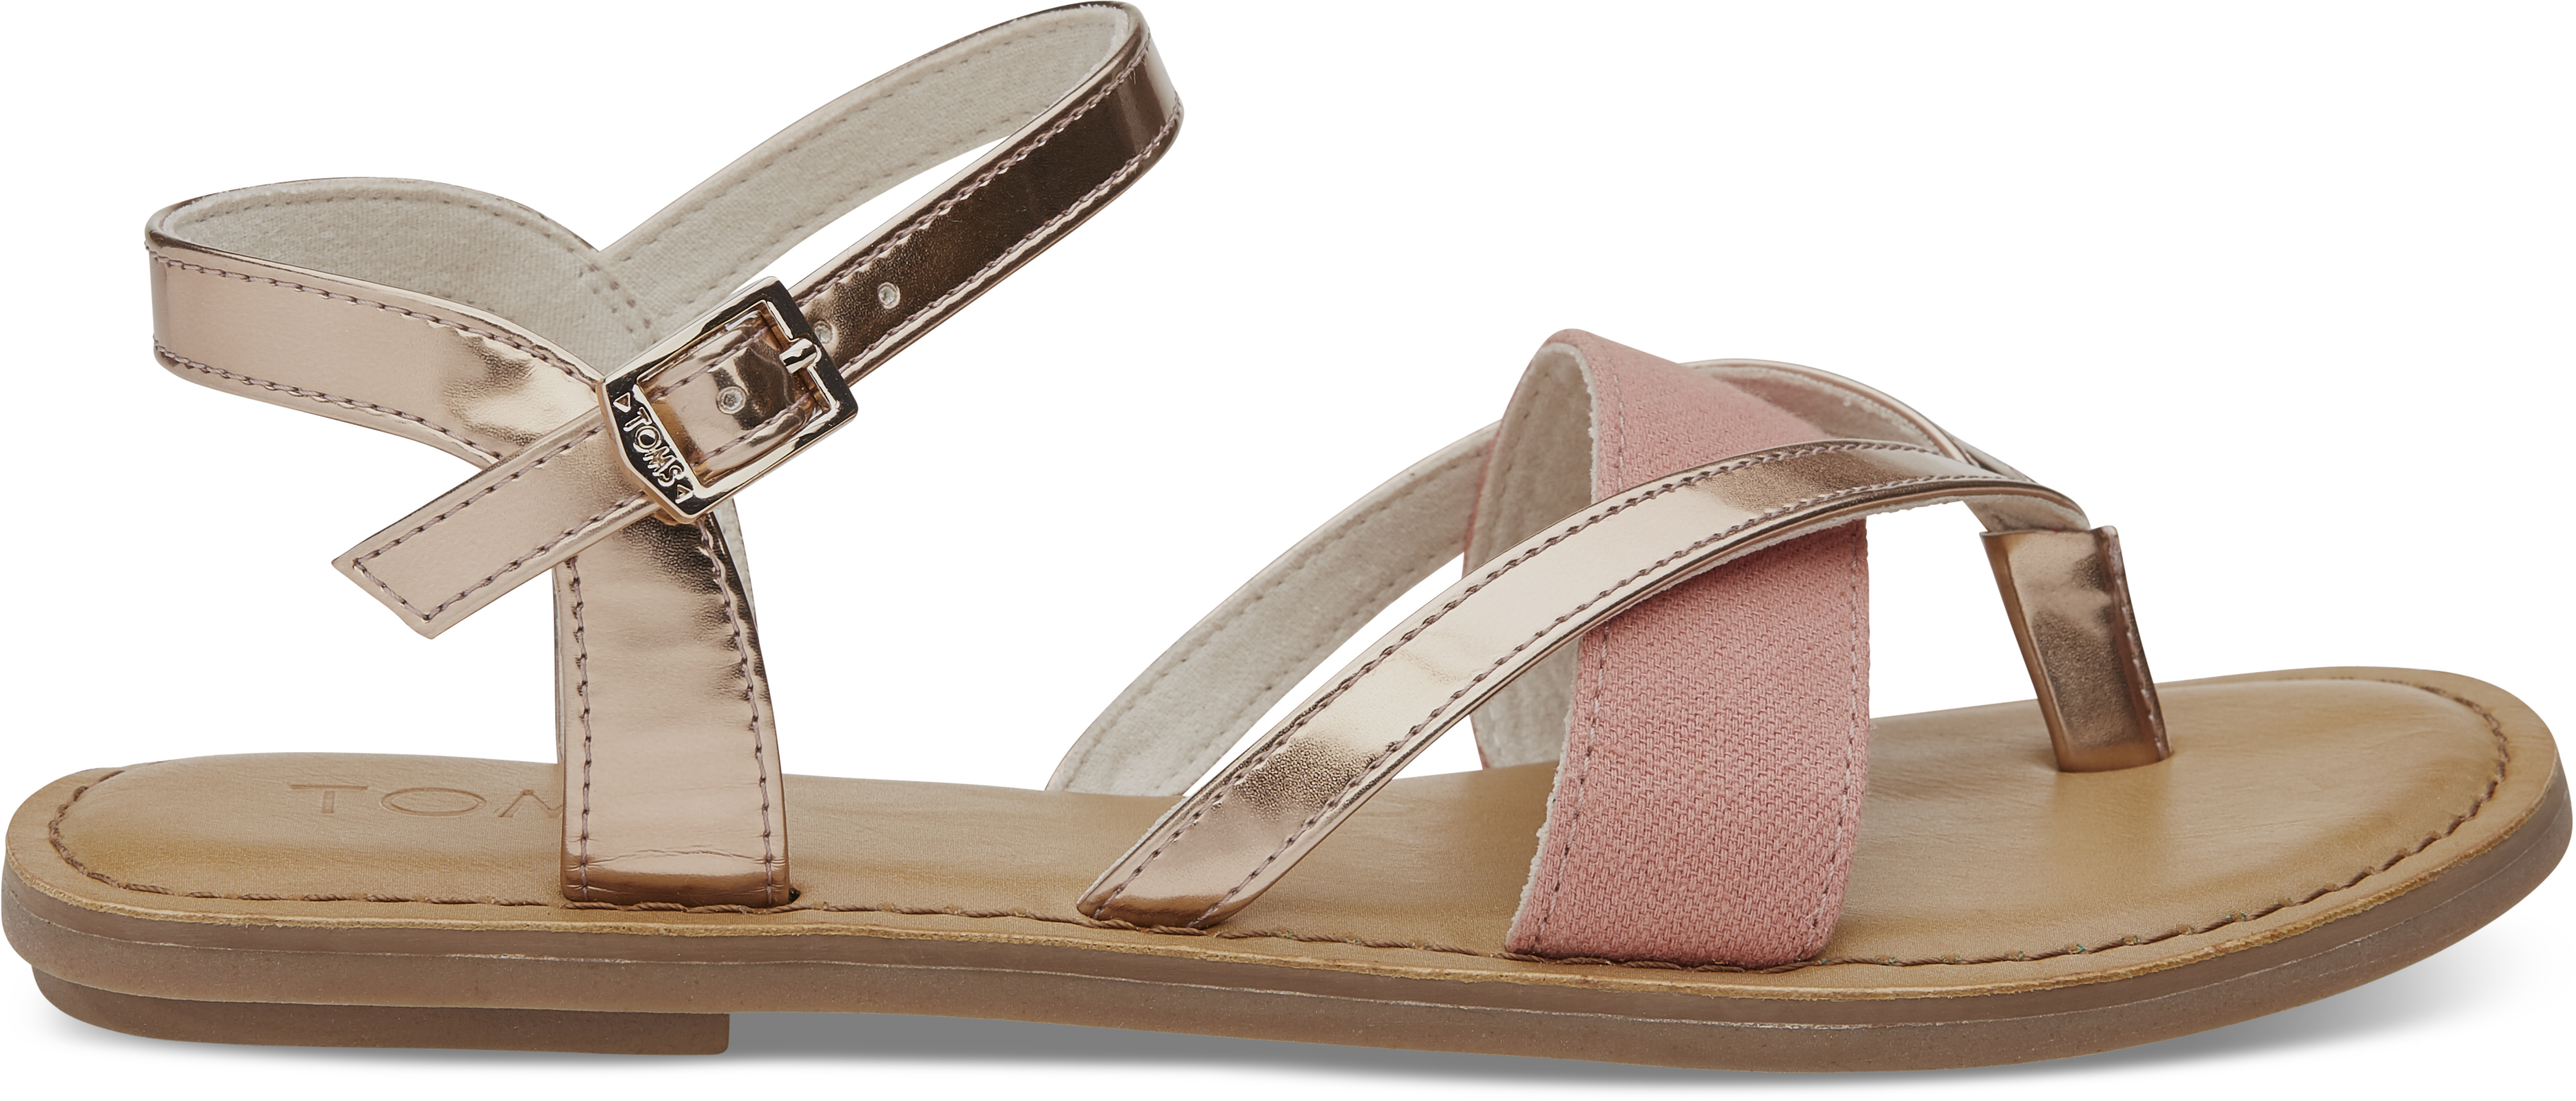 Dámské stříbrné sandálky TOMS Specchio Oxford Lexie 5,5/36